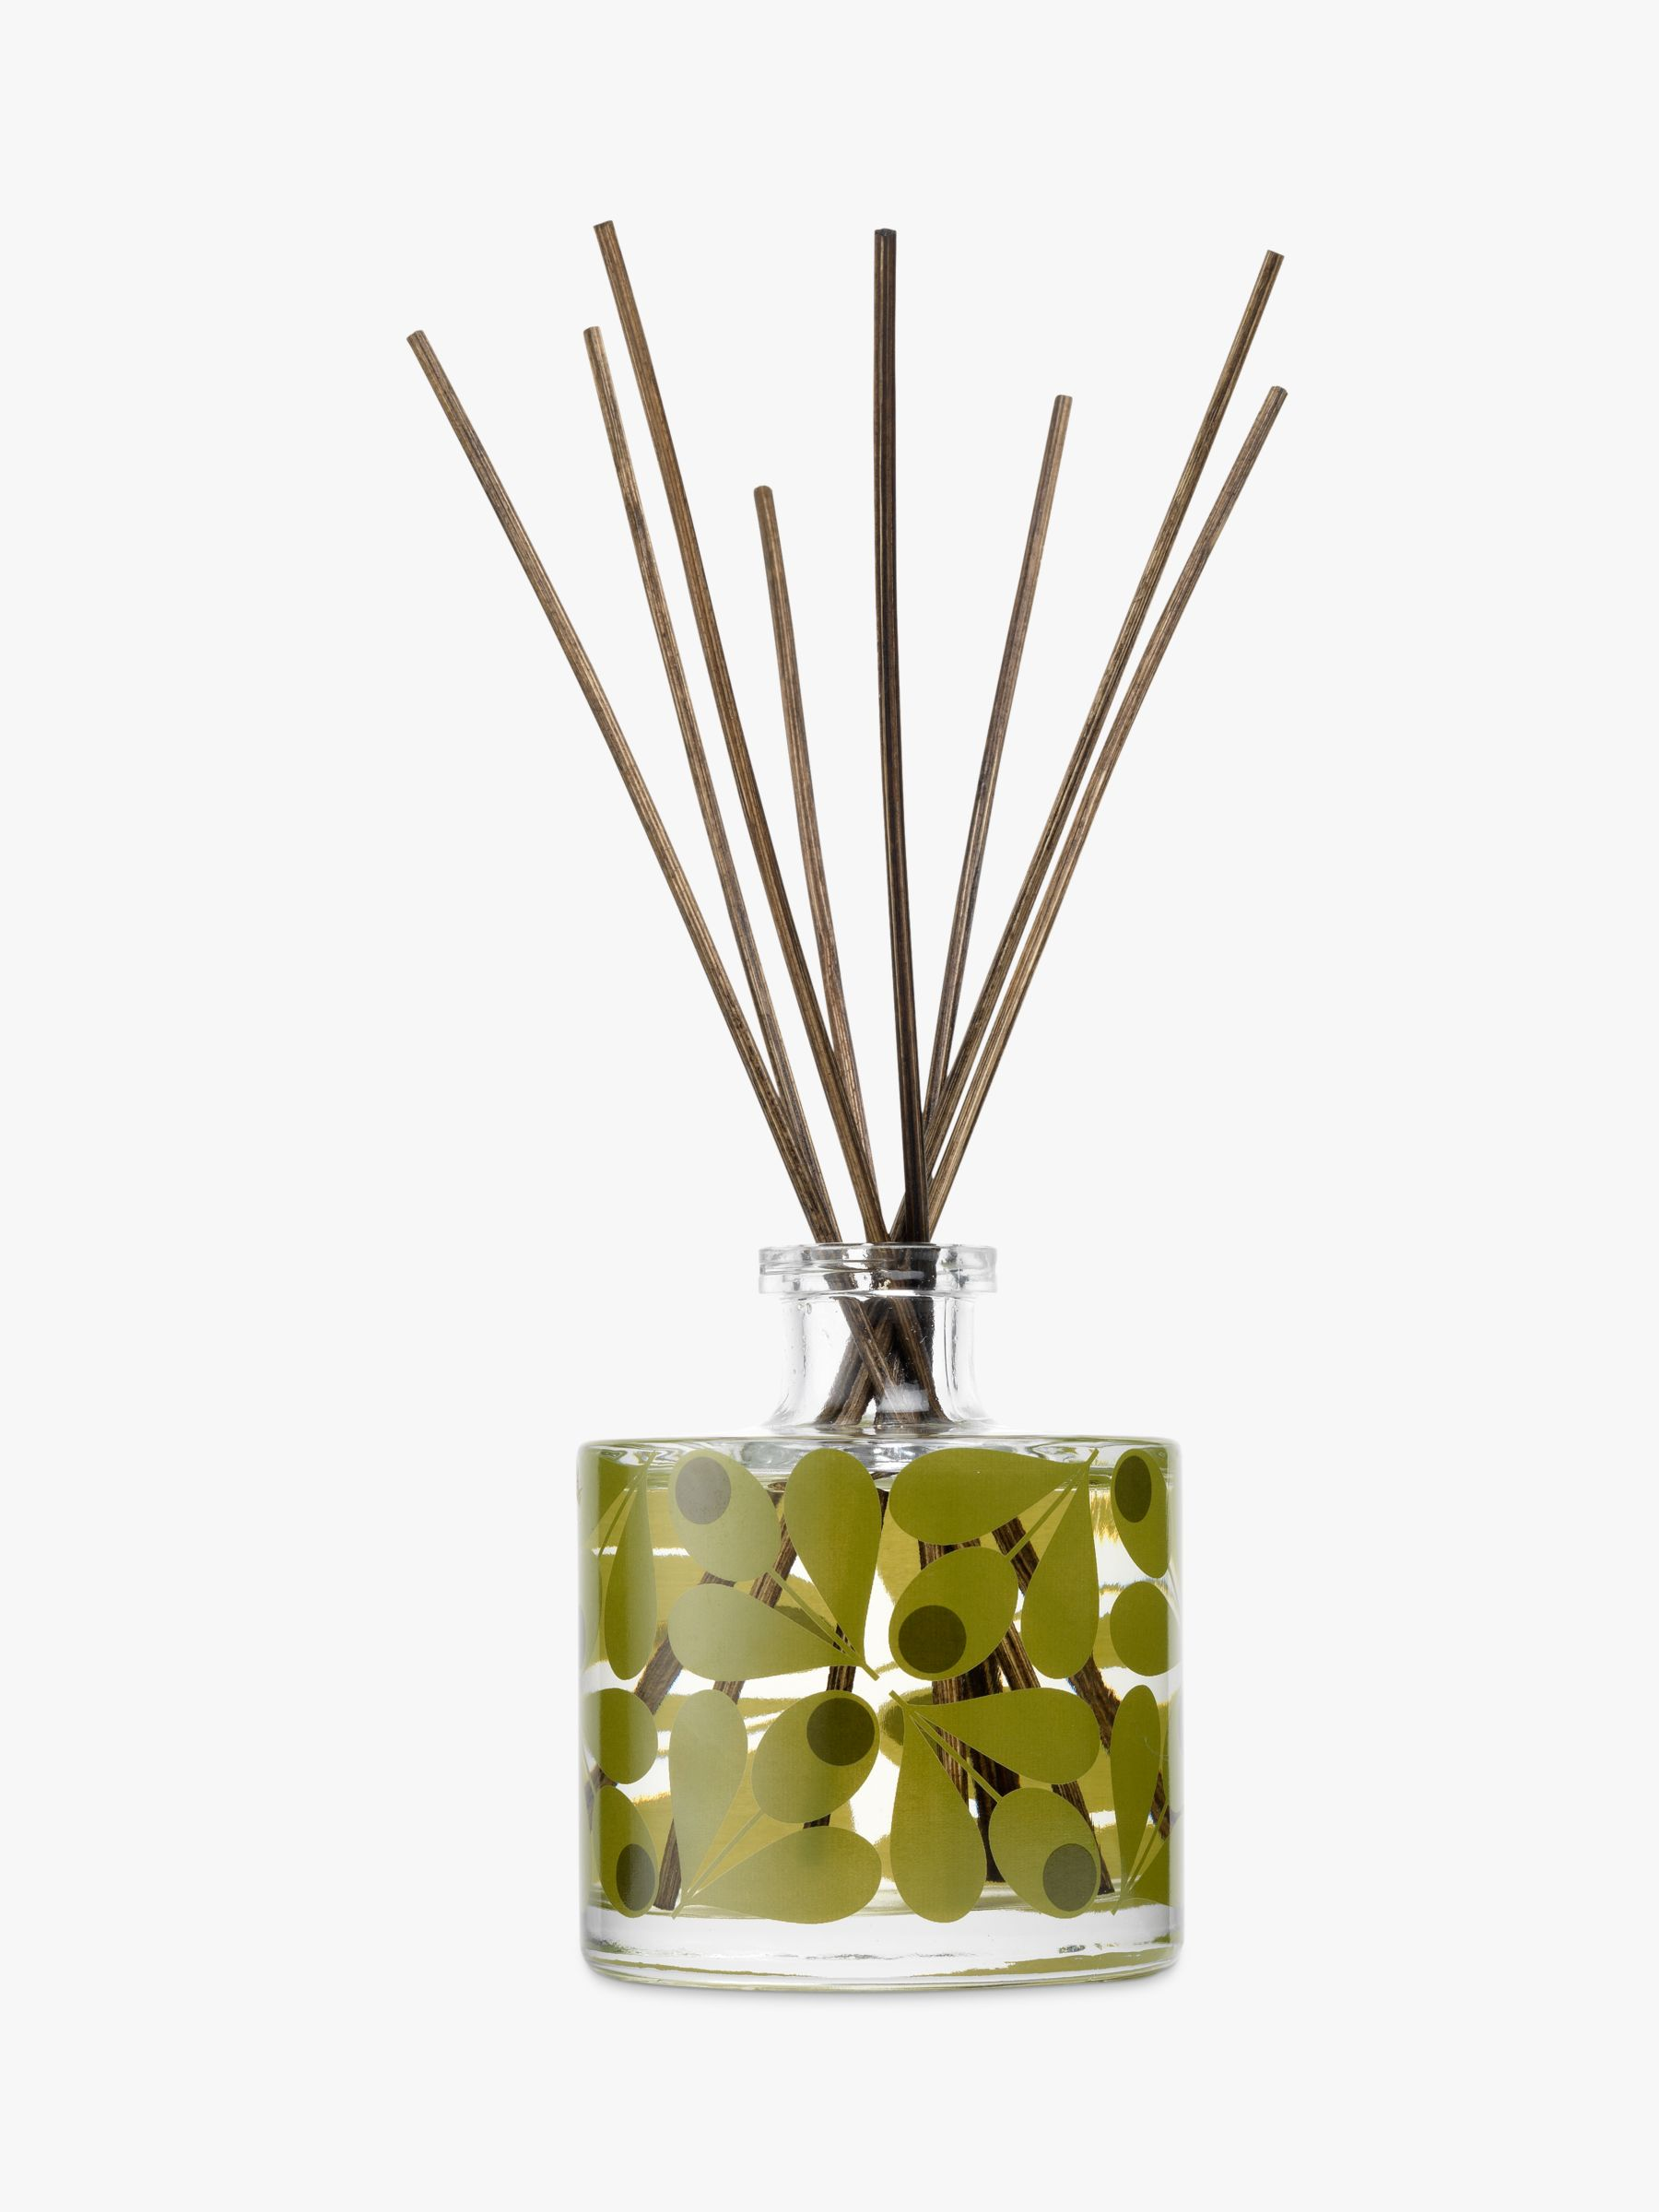 Orla Kiely Orla Kiely Fig Tree Scented Reed Diffuser, 200ml